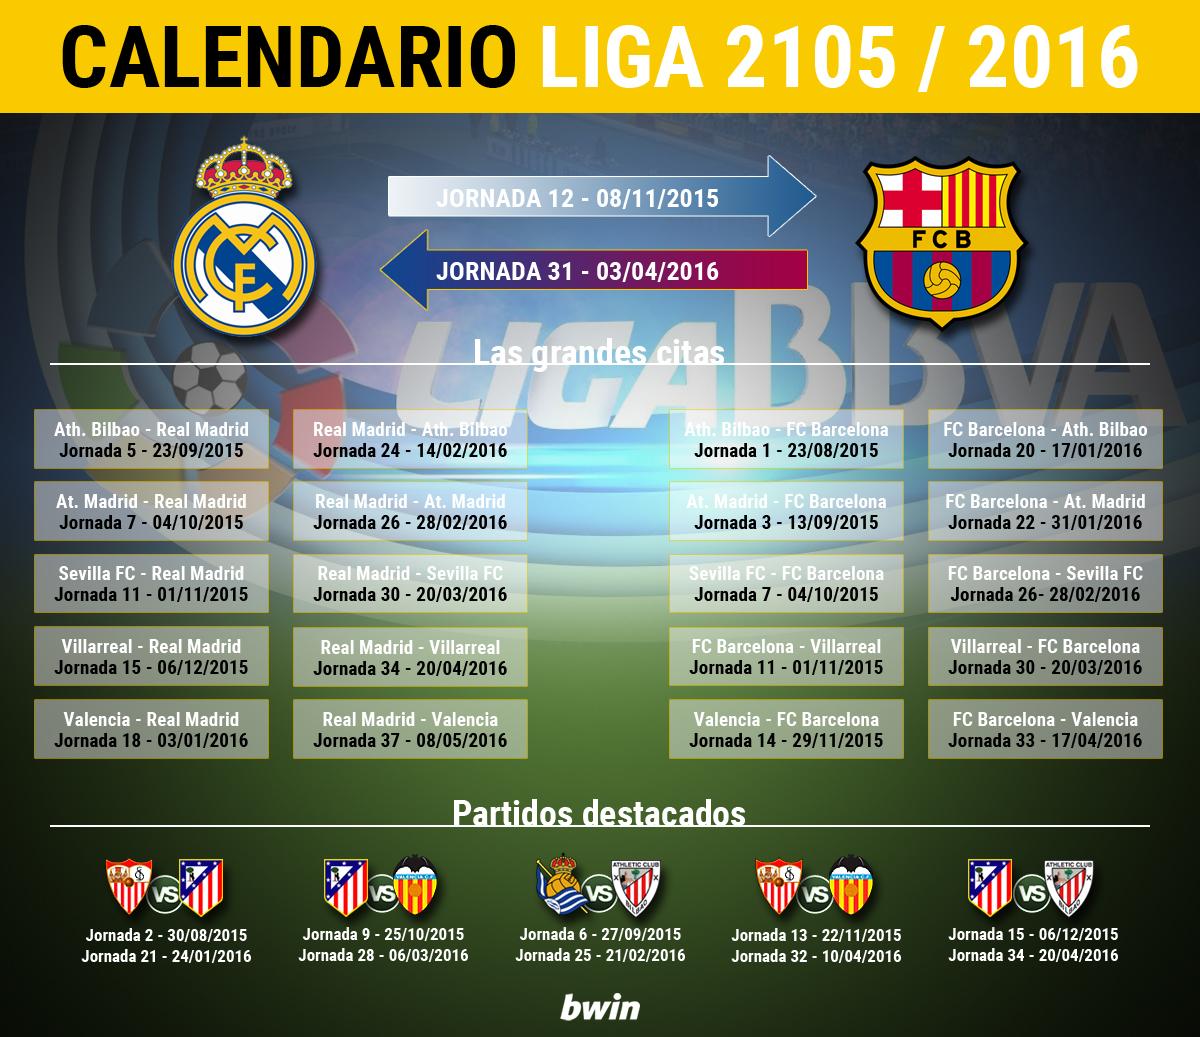 Calendario De La Liga Espanola De Futbol.Calendario De Primera Division De La Liga Futbol Bwin